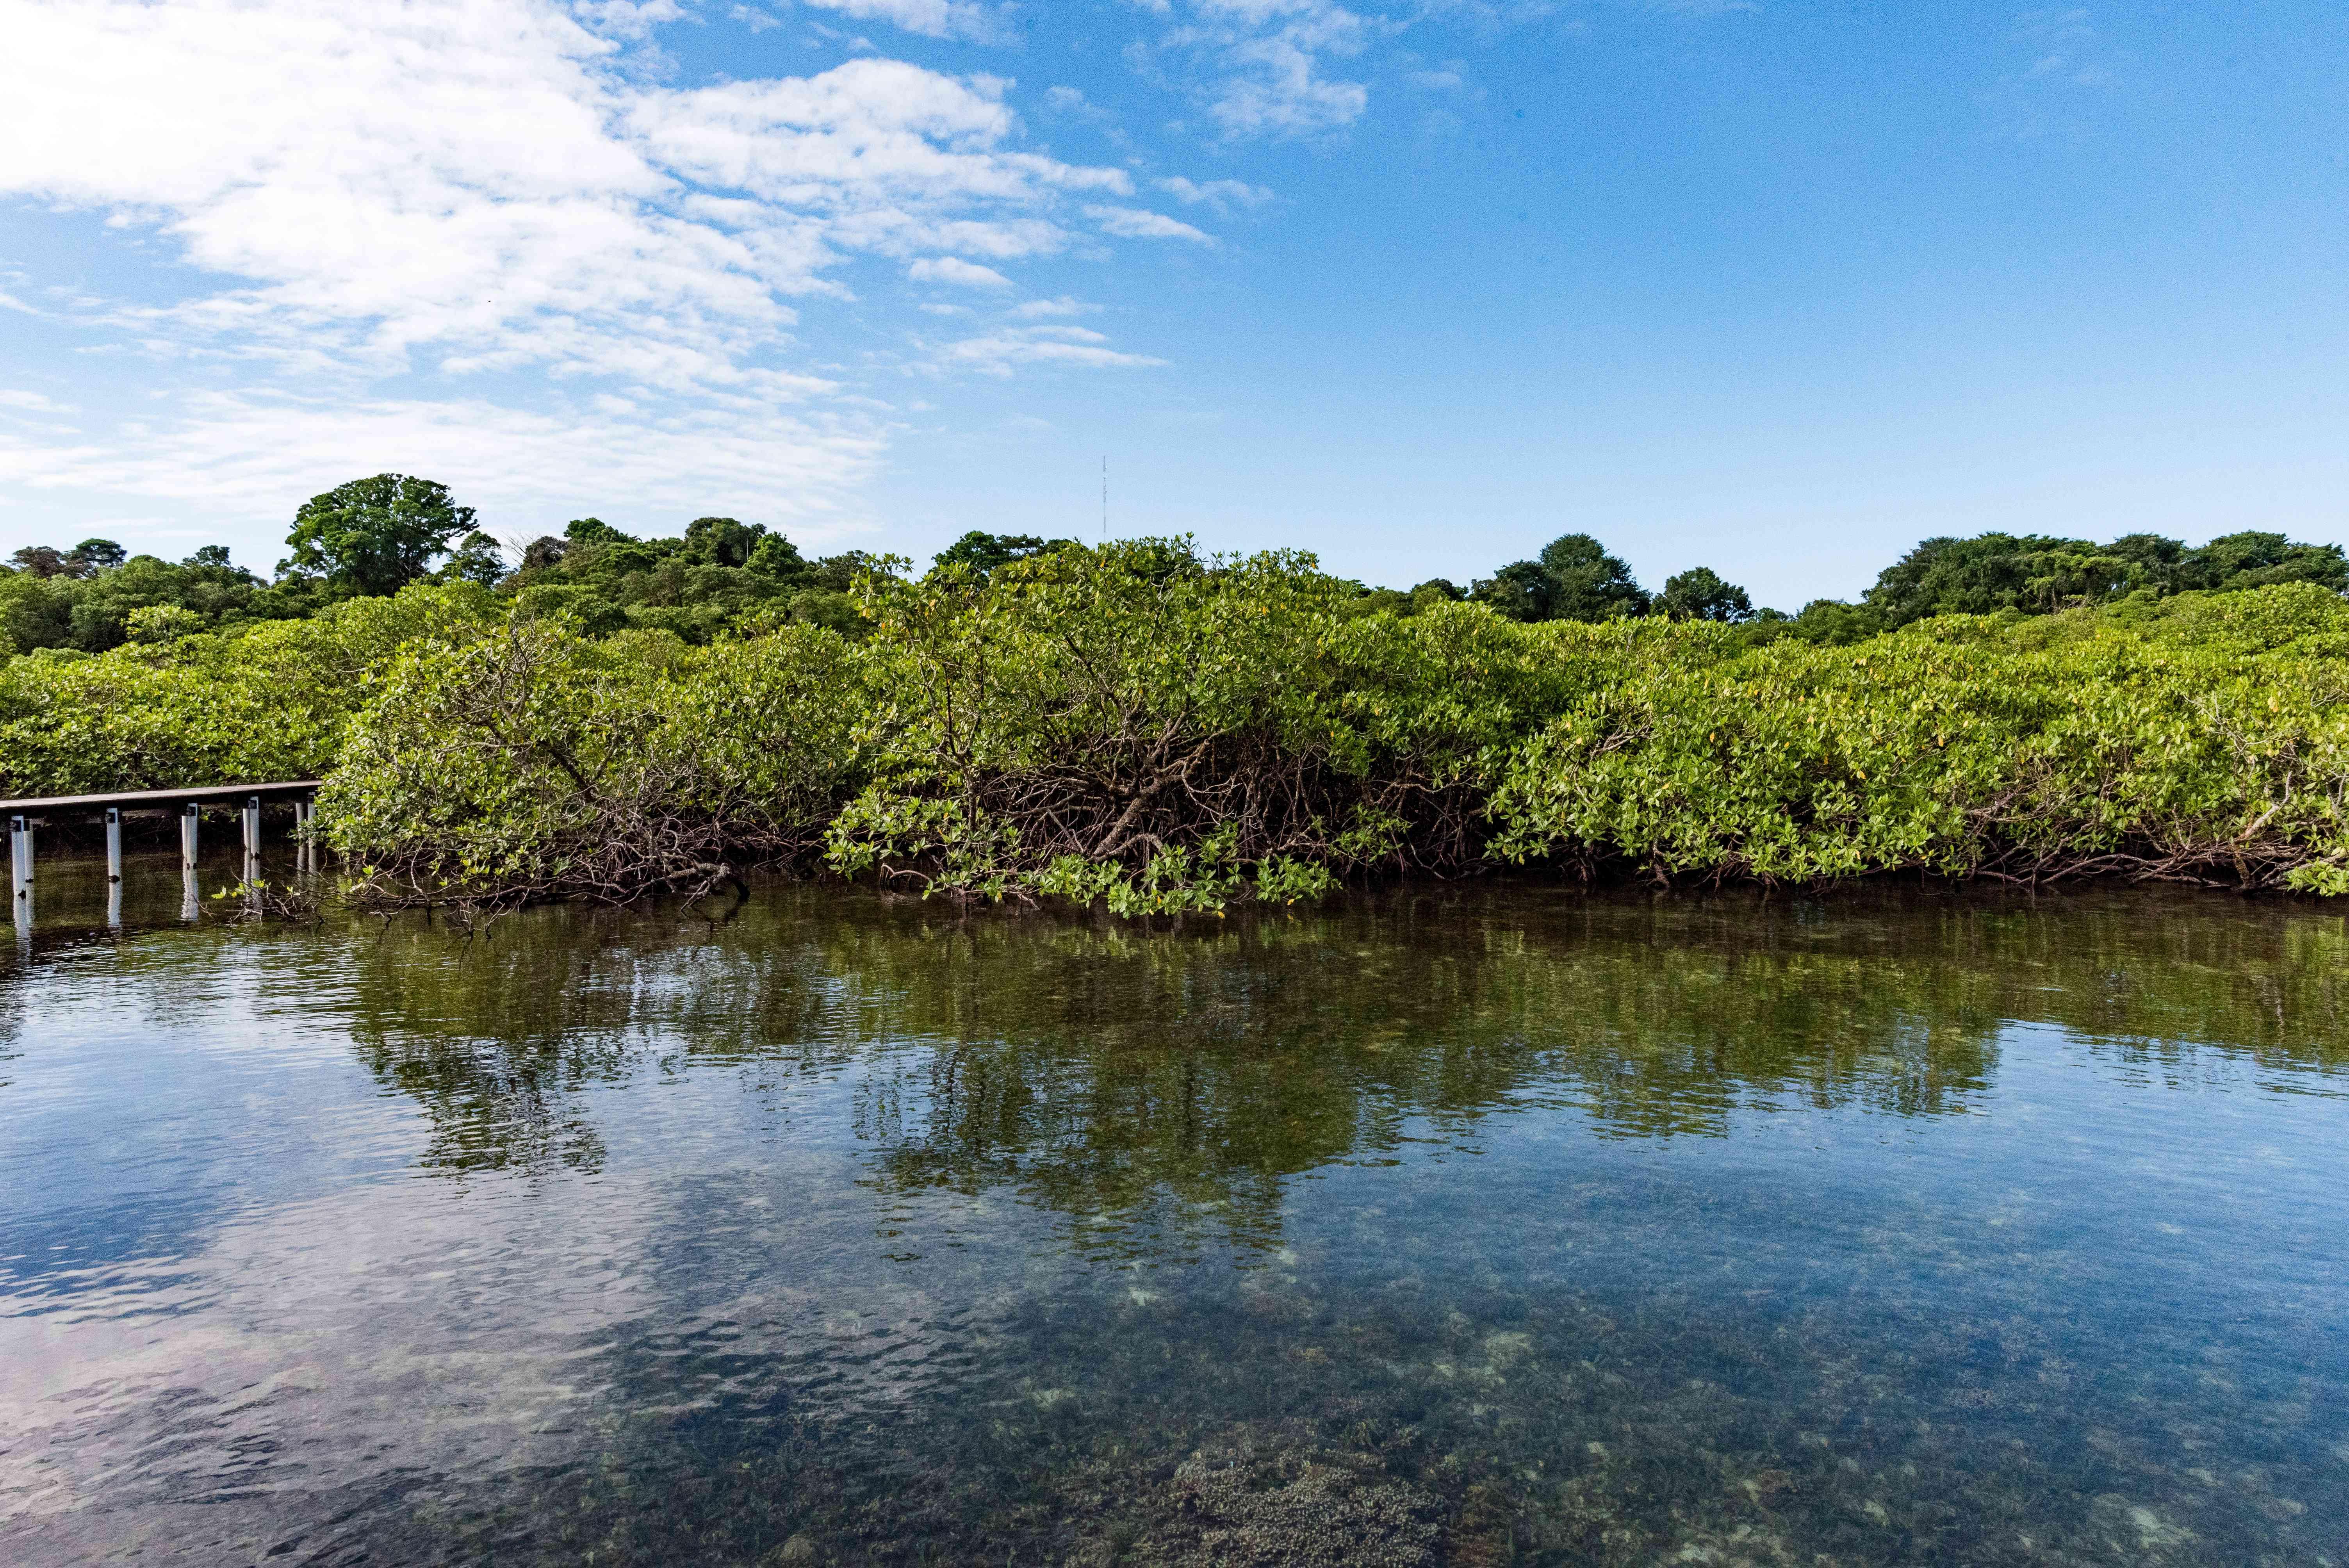 Clear waters along the Bocas del toro coast